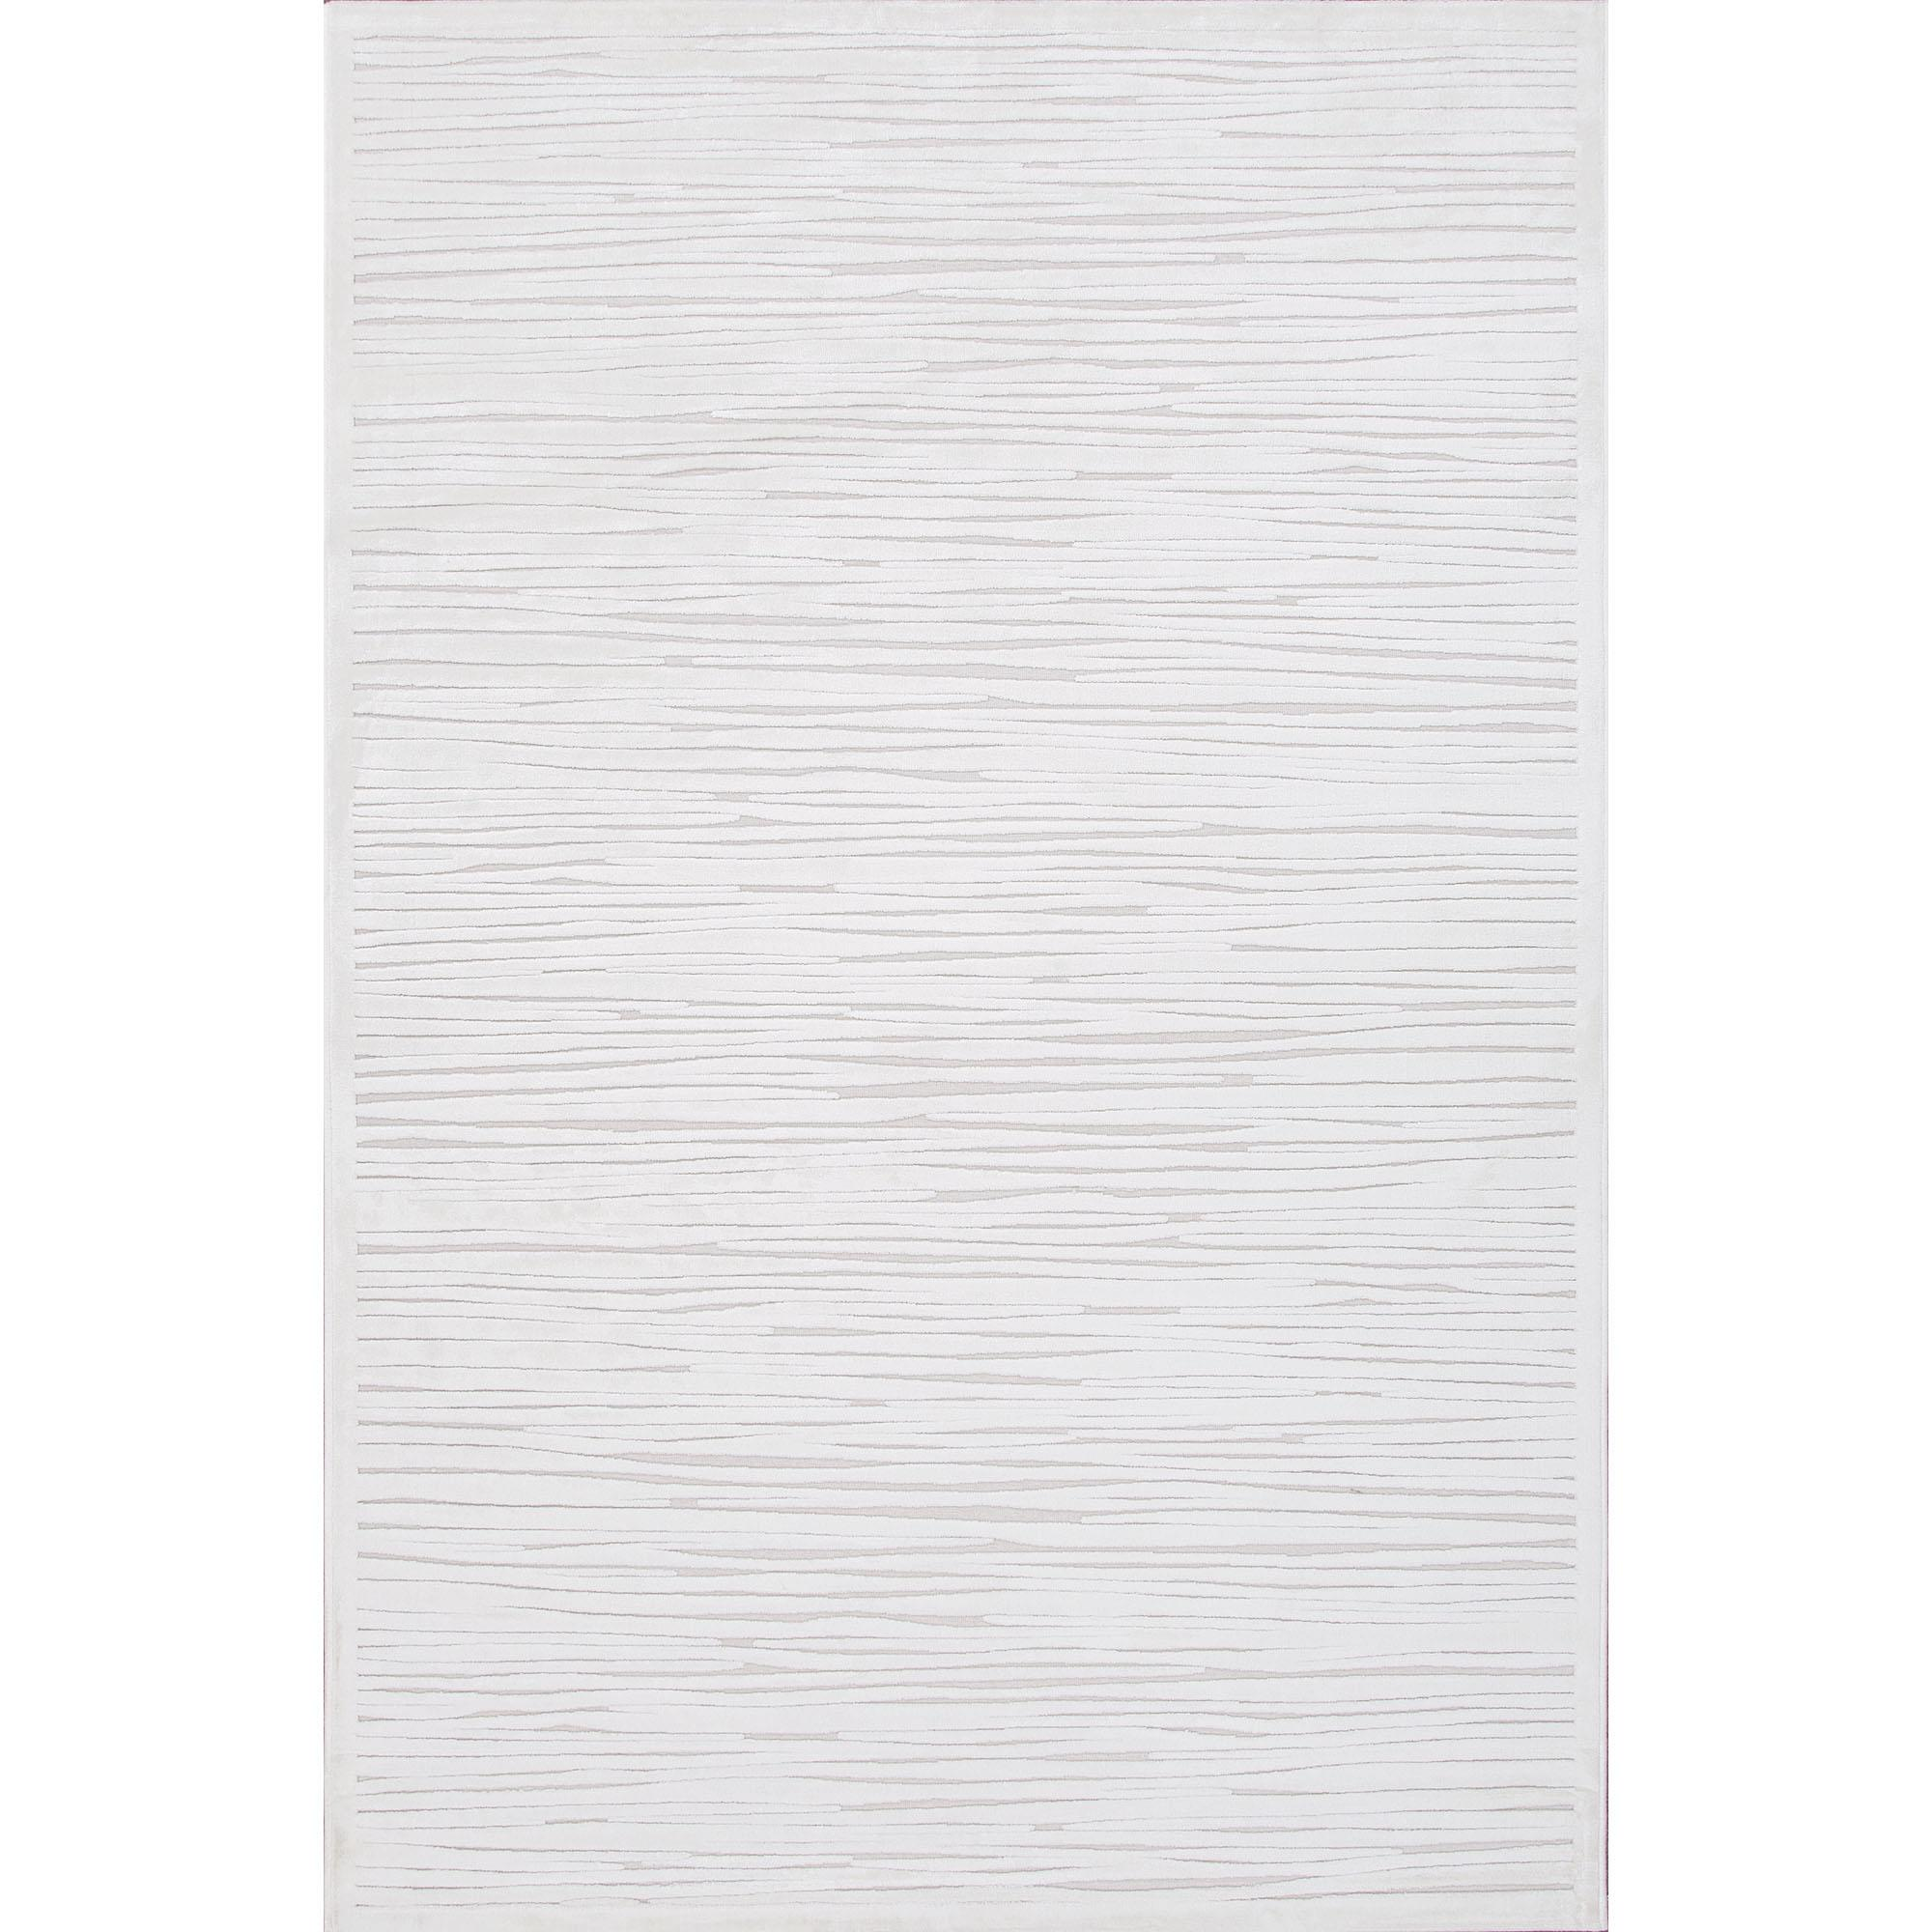 JAIPUR Rugs Fables 5 x 7.6 Rug - Item Number: RUG108724